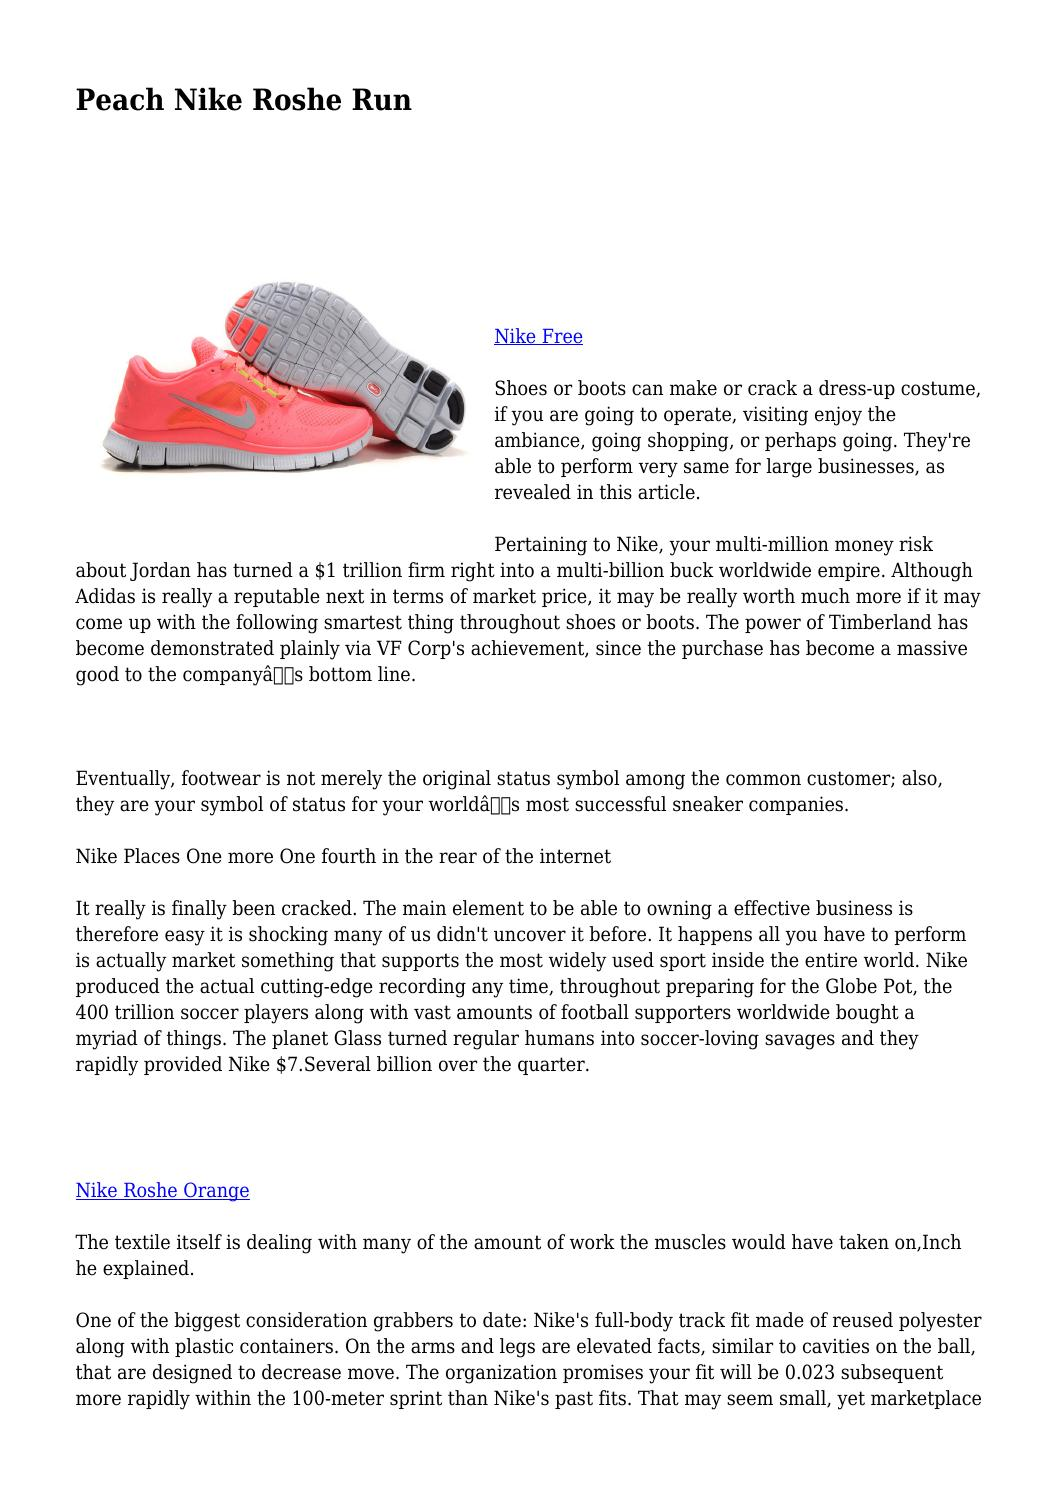 Peach Nike Roshe Run By Greenposterity838 Issuu